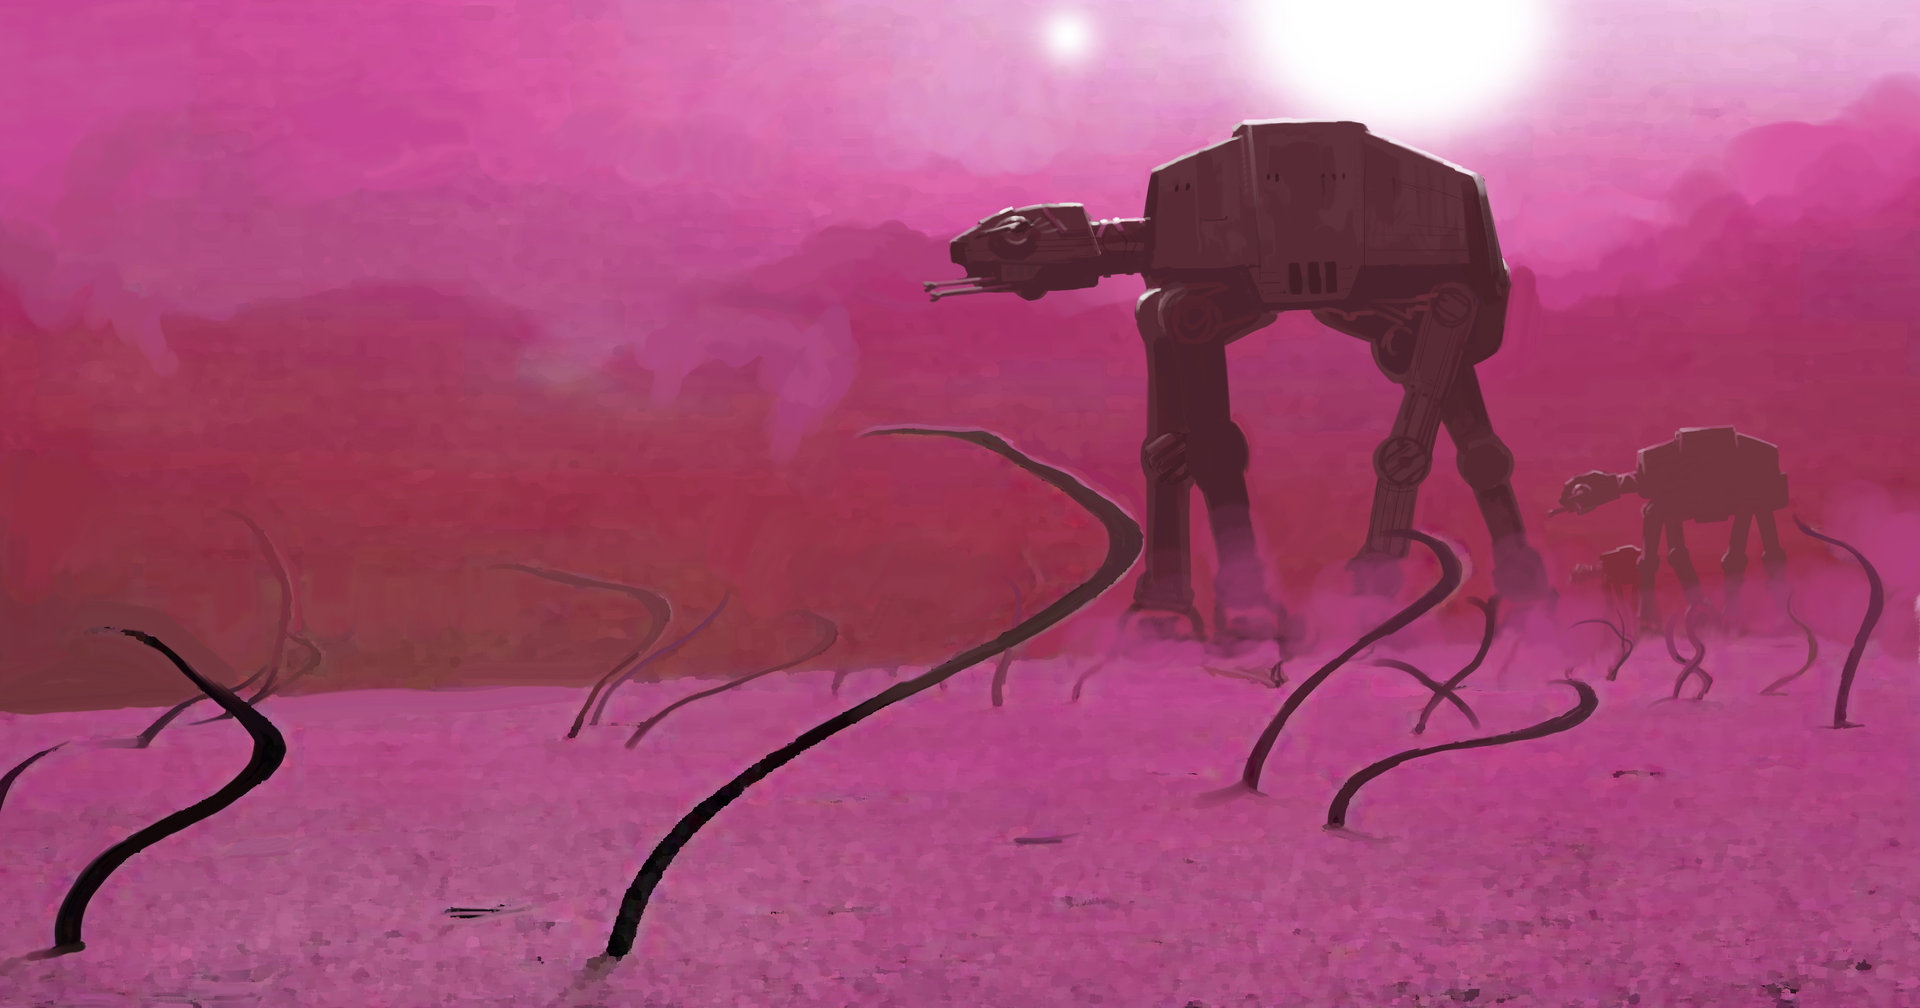 Midhat kapetanovic join the empire see the galaxy vol4